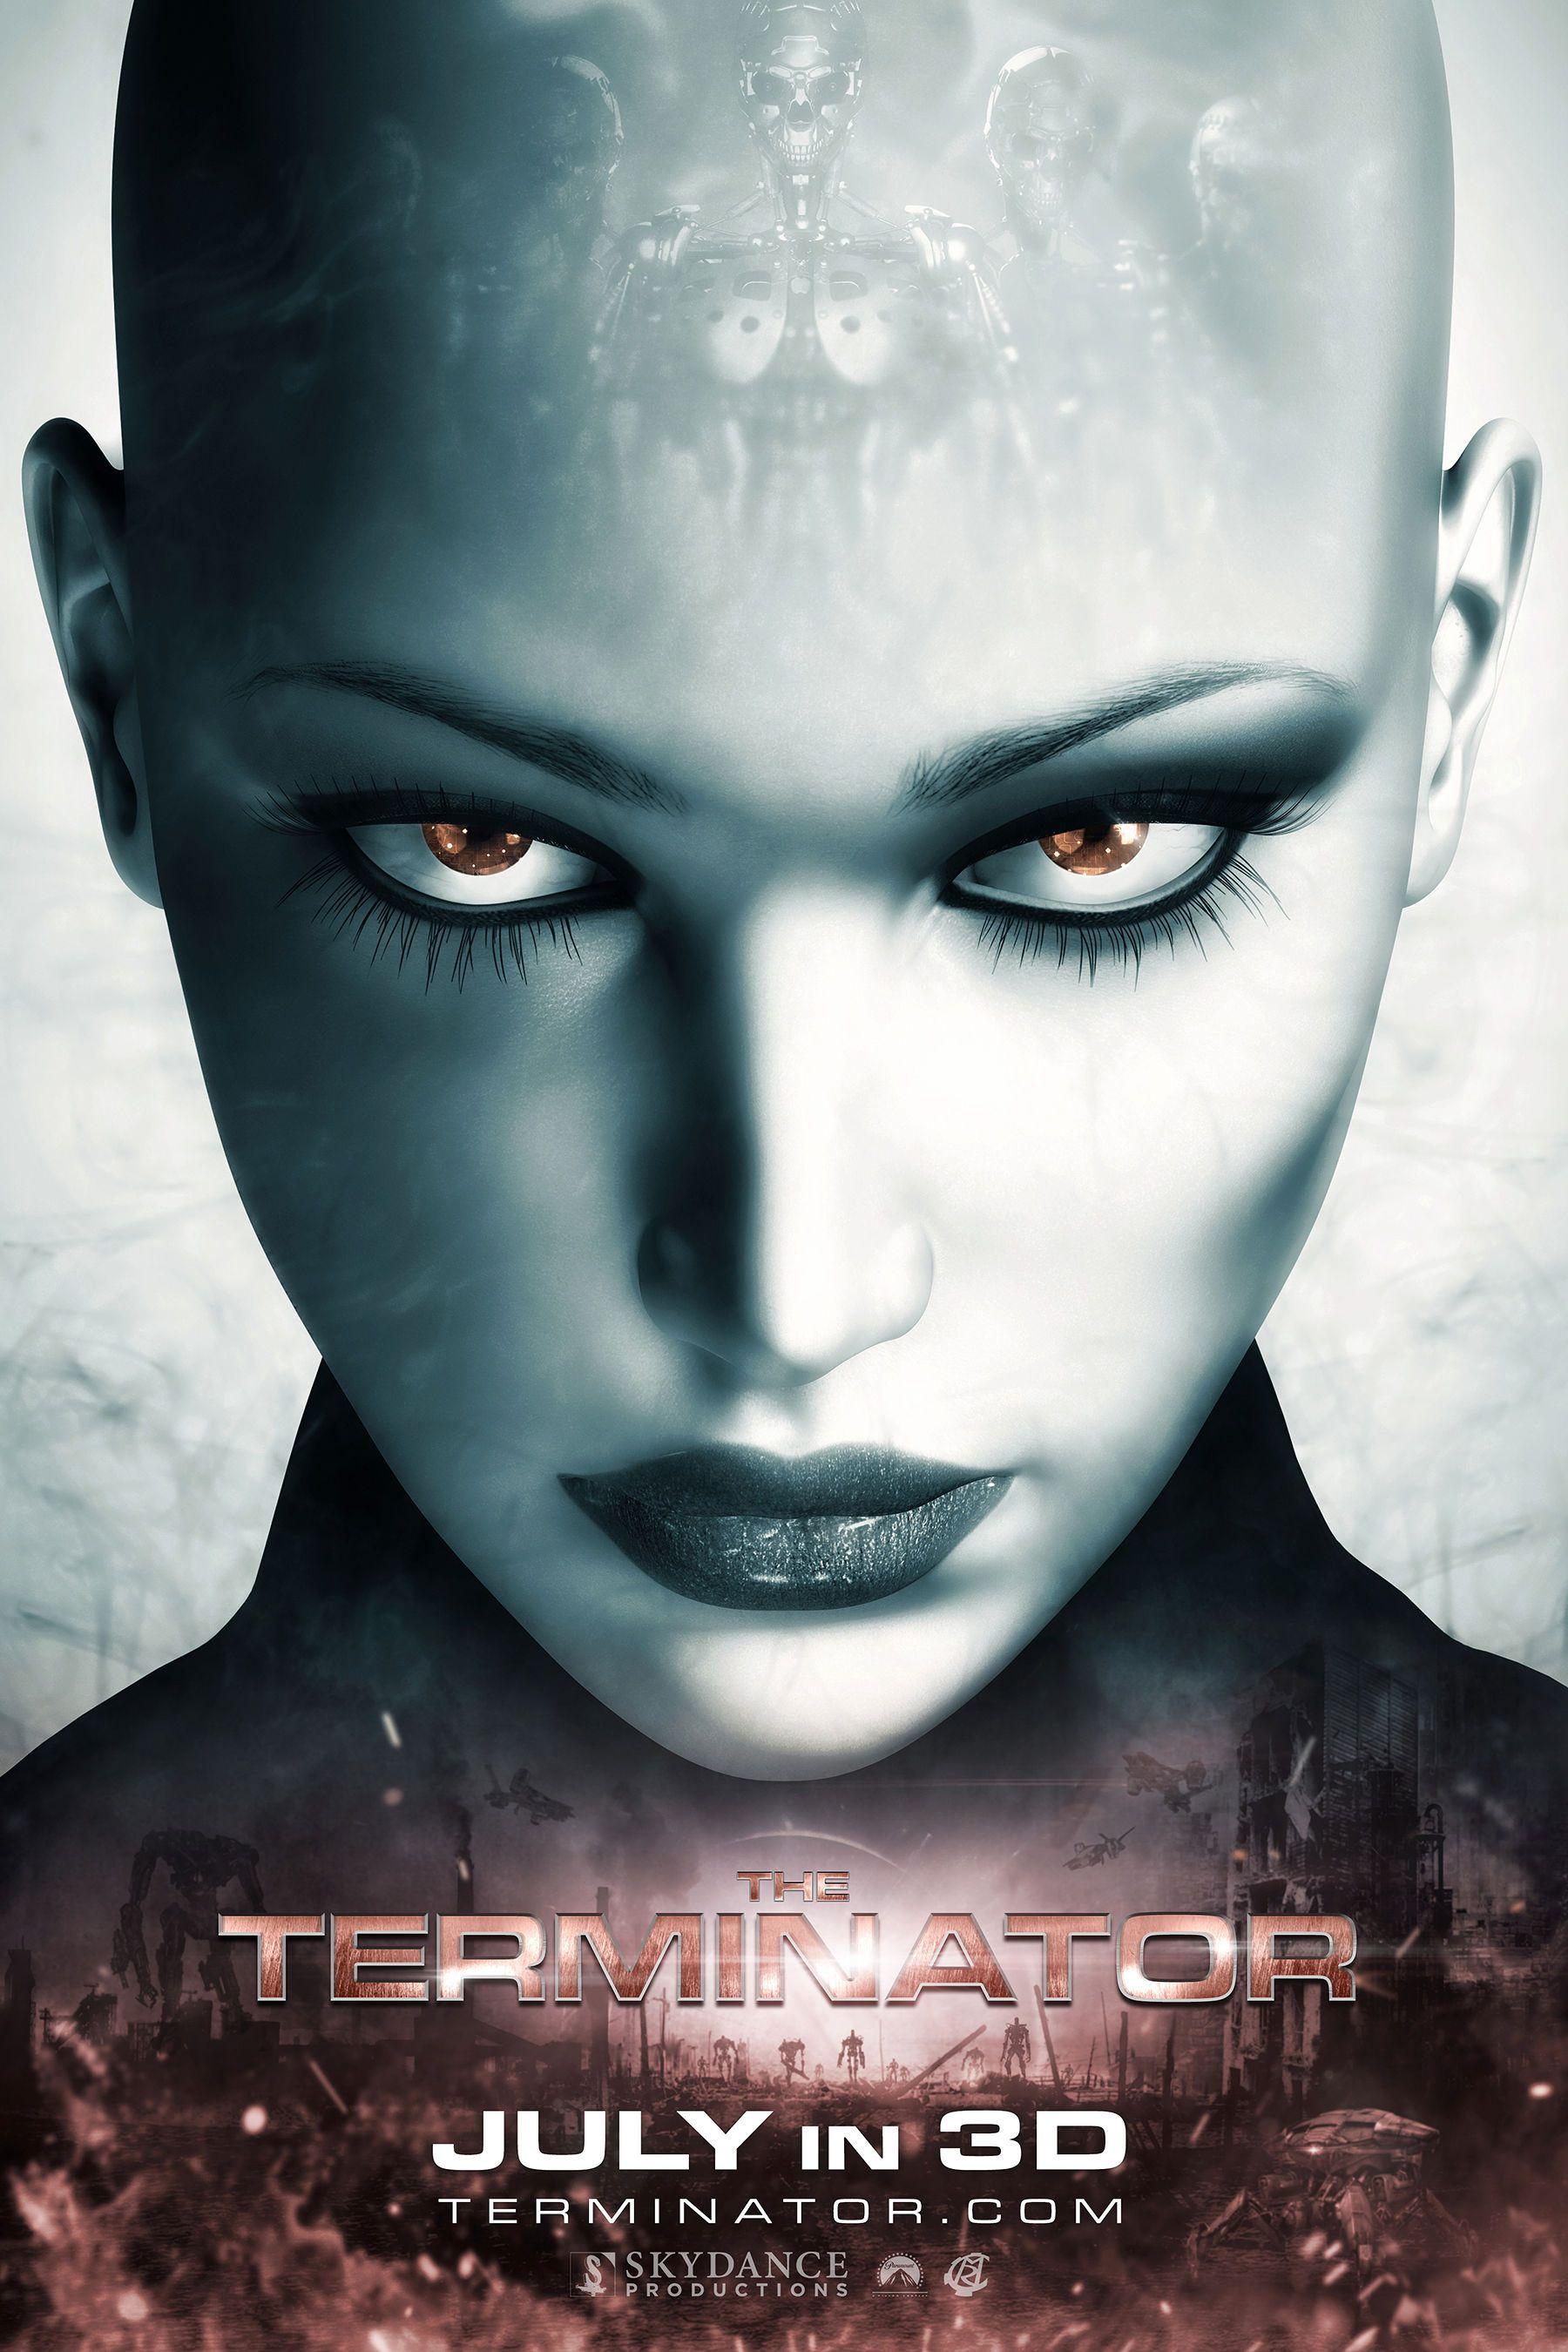 the terminator movie poster by creator ryan crain